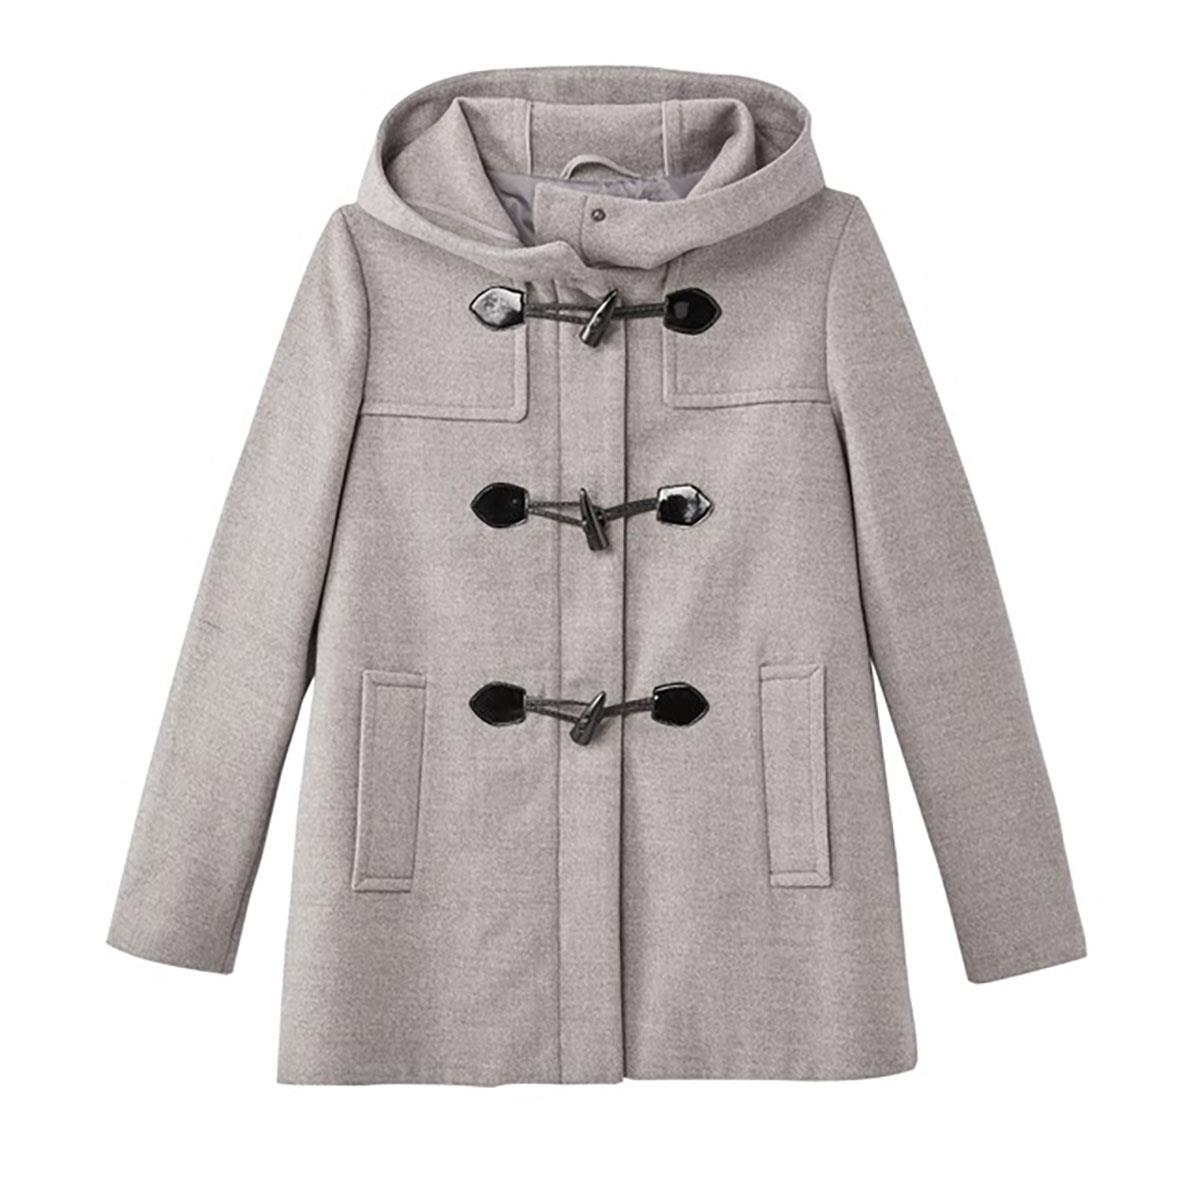 3c9b95e8ebe2c Rebajas 2019  abrigos baratos de mujer - InStyle